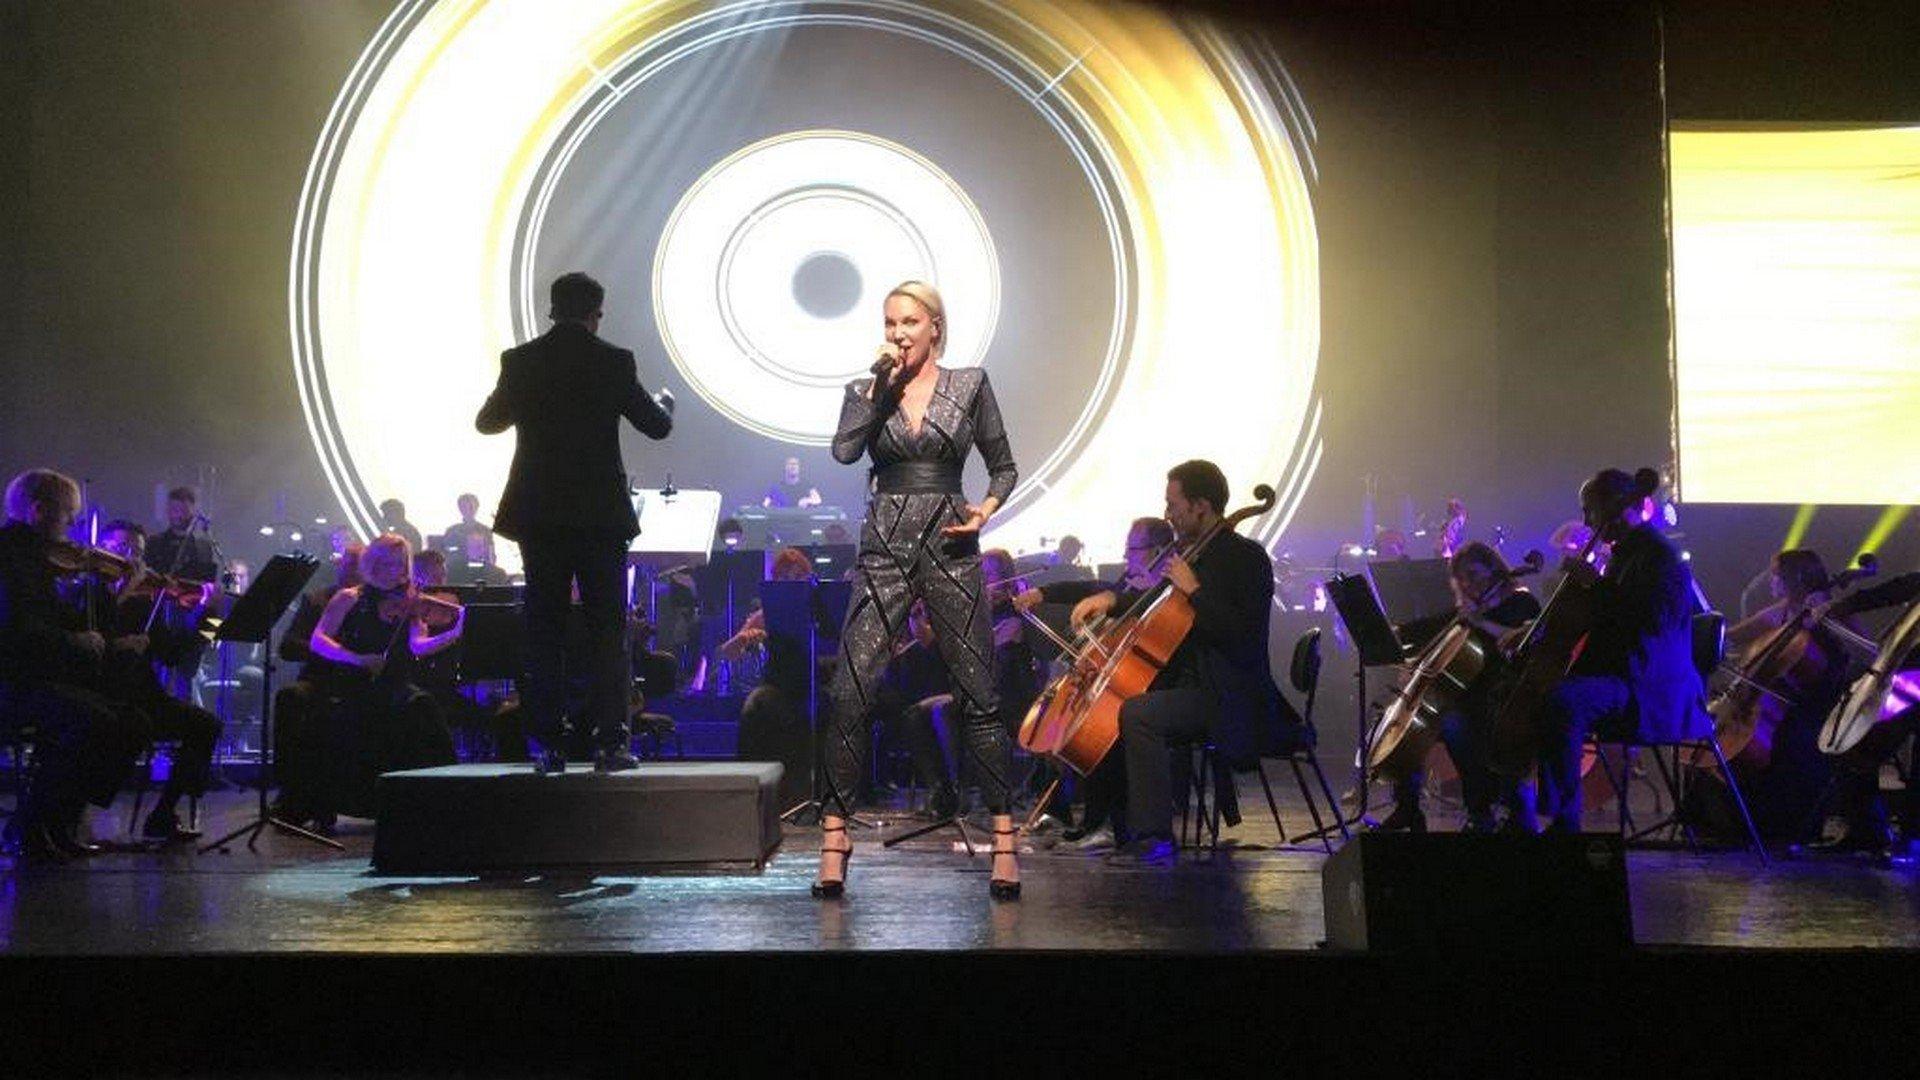 Het symfonische orkest in het Madrileense Real Teatro ontroert Kate Ryan - Kate Ryan 7